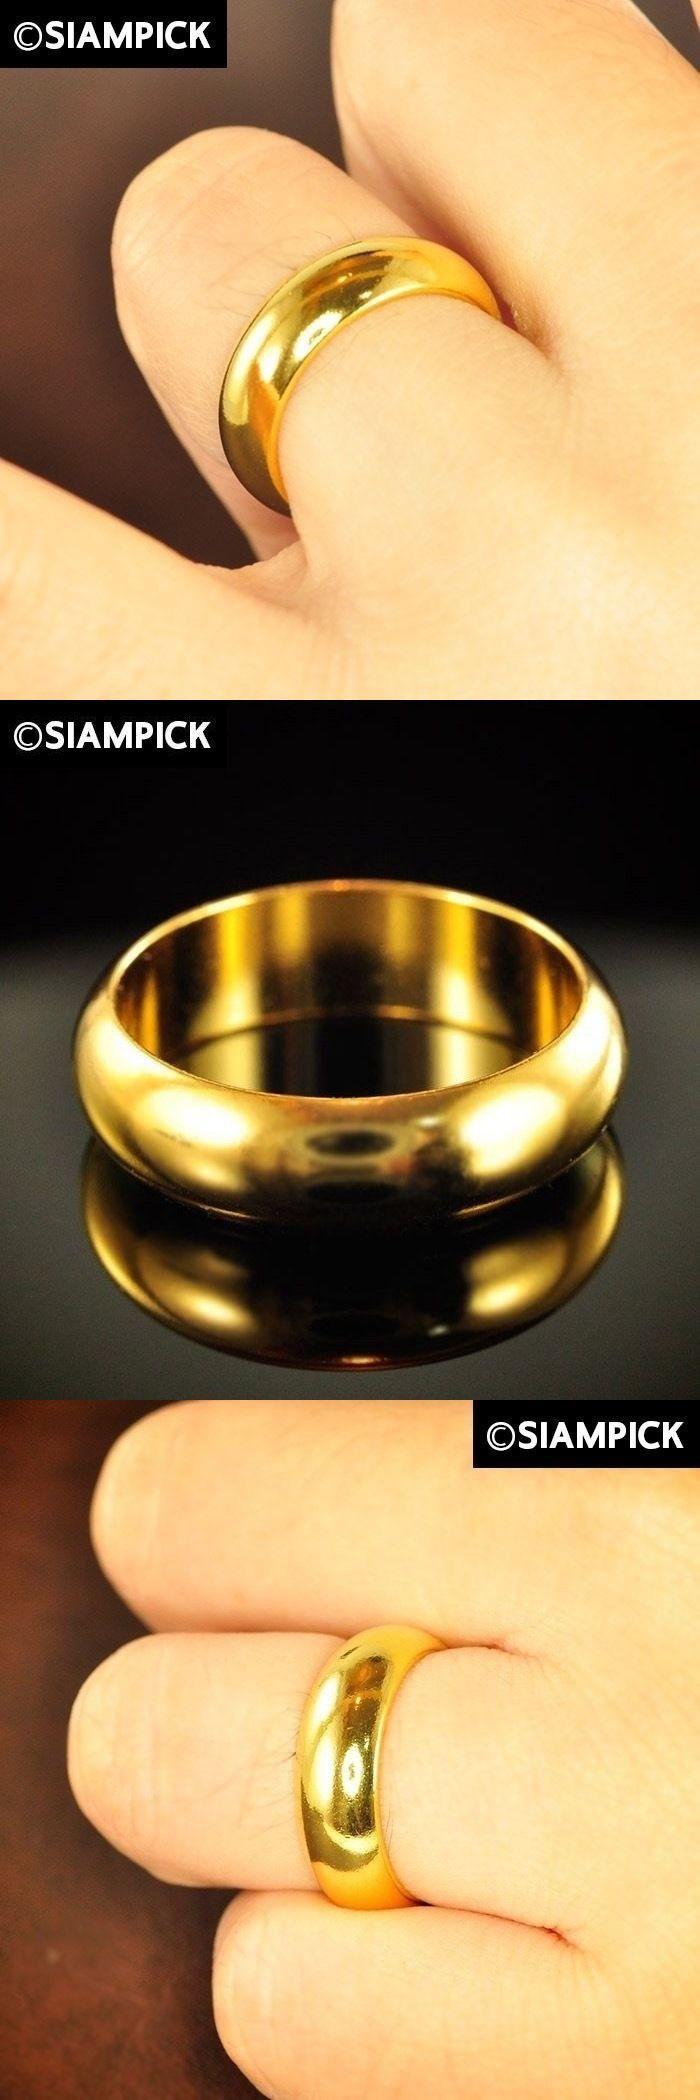 Rings 98512 Shiny 24k Thai Baht Yellow Gold Plain Ring Wedding Engagement Bridesmaid Gift Gp Buy It Now Wedding Rings Engagement Plain Rings Wedding Rings